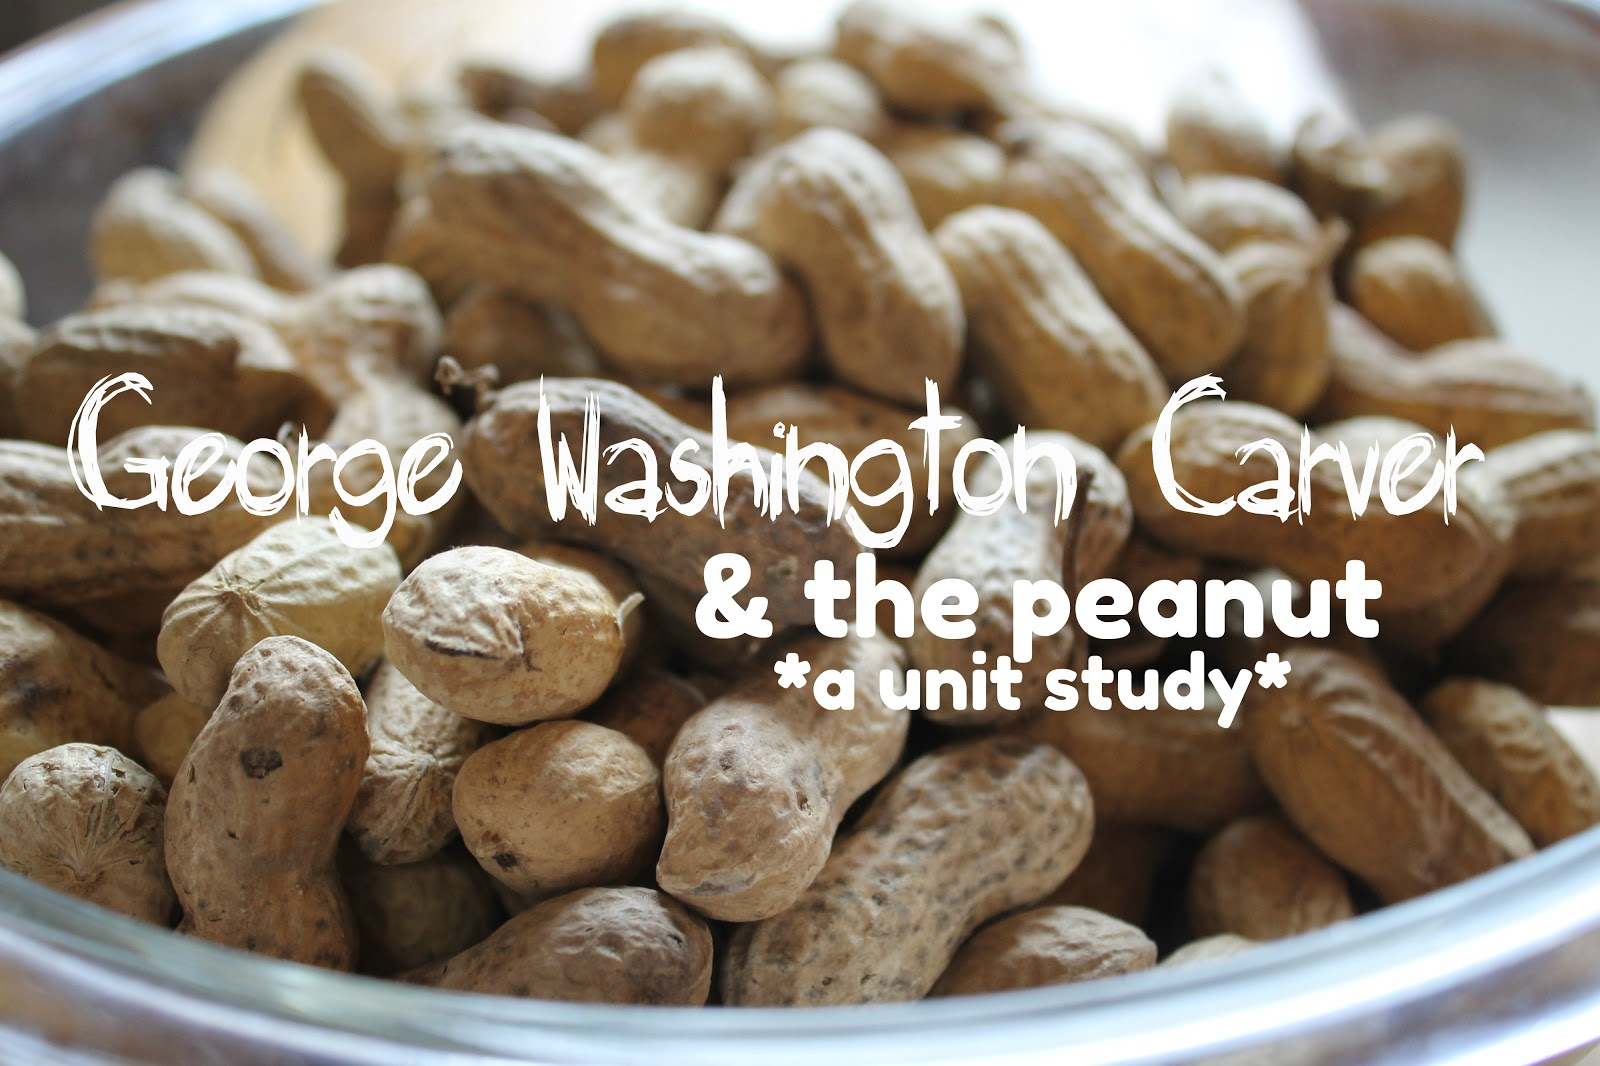 George washington carver crafts - George Washington Carver The Peanut A Unit Study